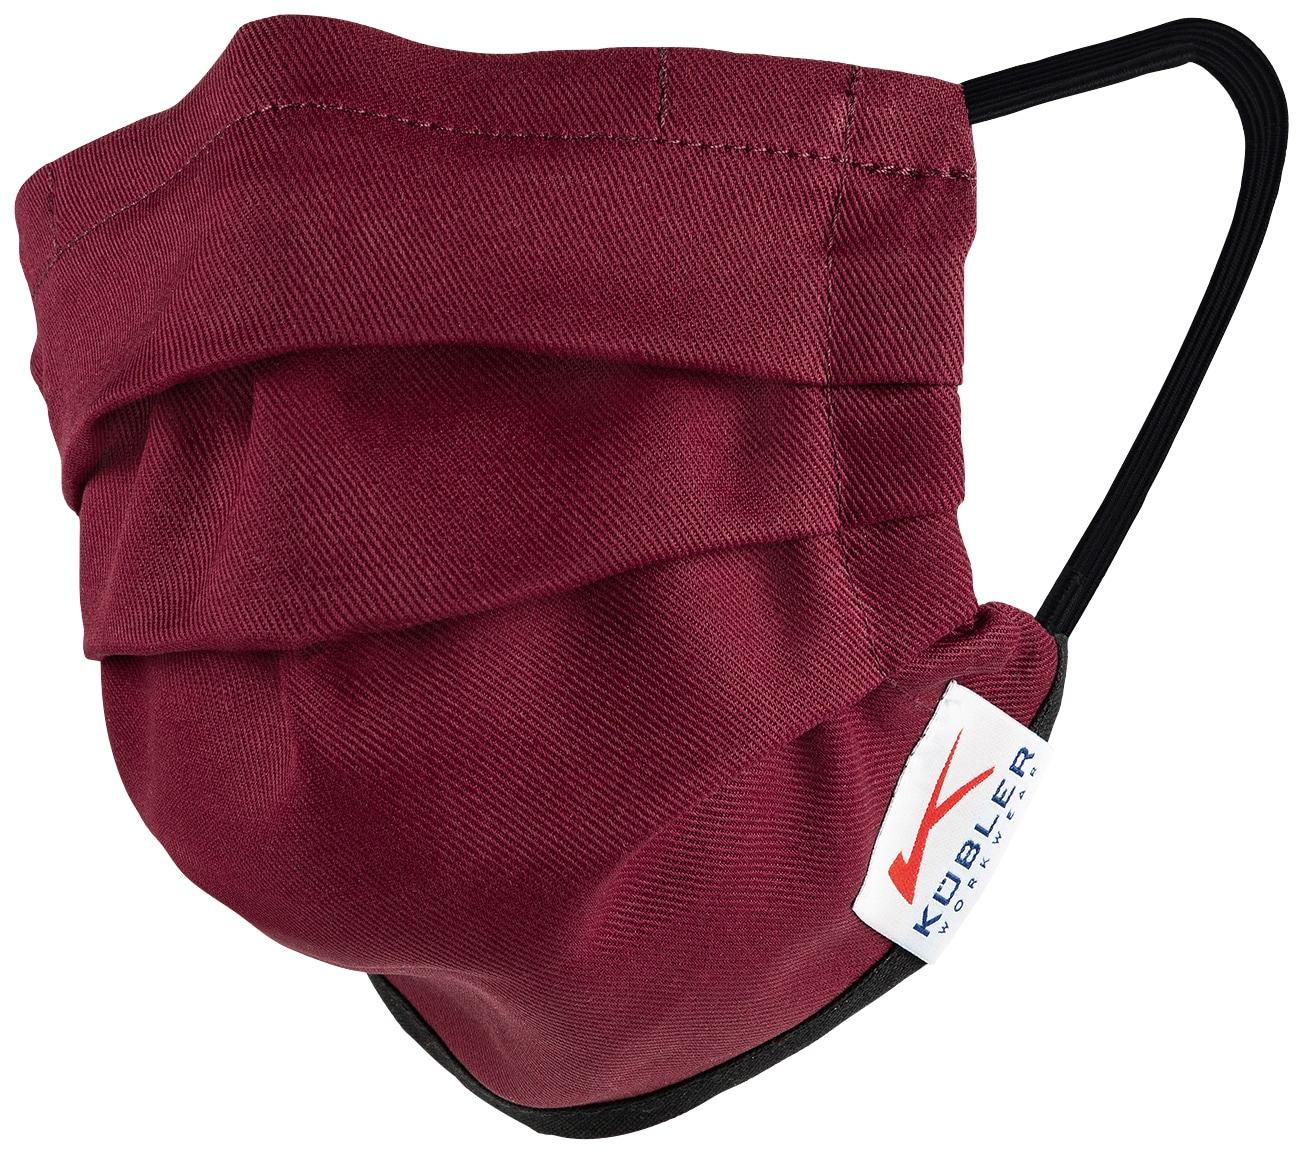 Kübler Mund-Nasen-Maske 8105 Gesichtsmaske (Packung, 10 Stück)